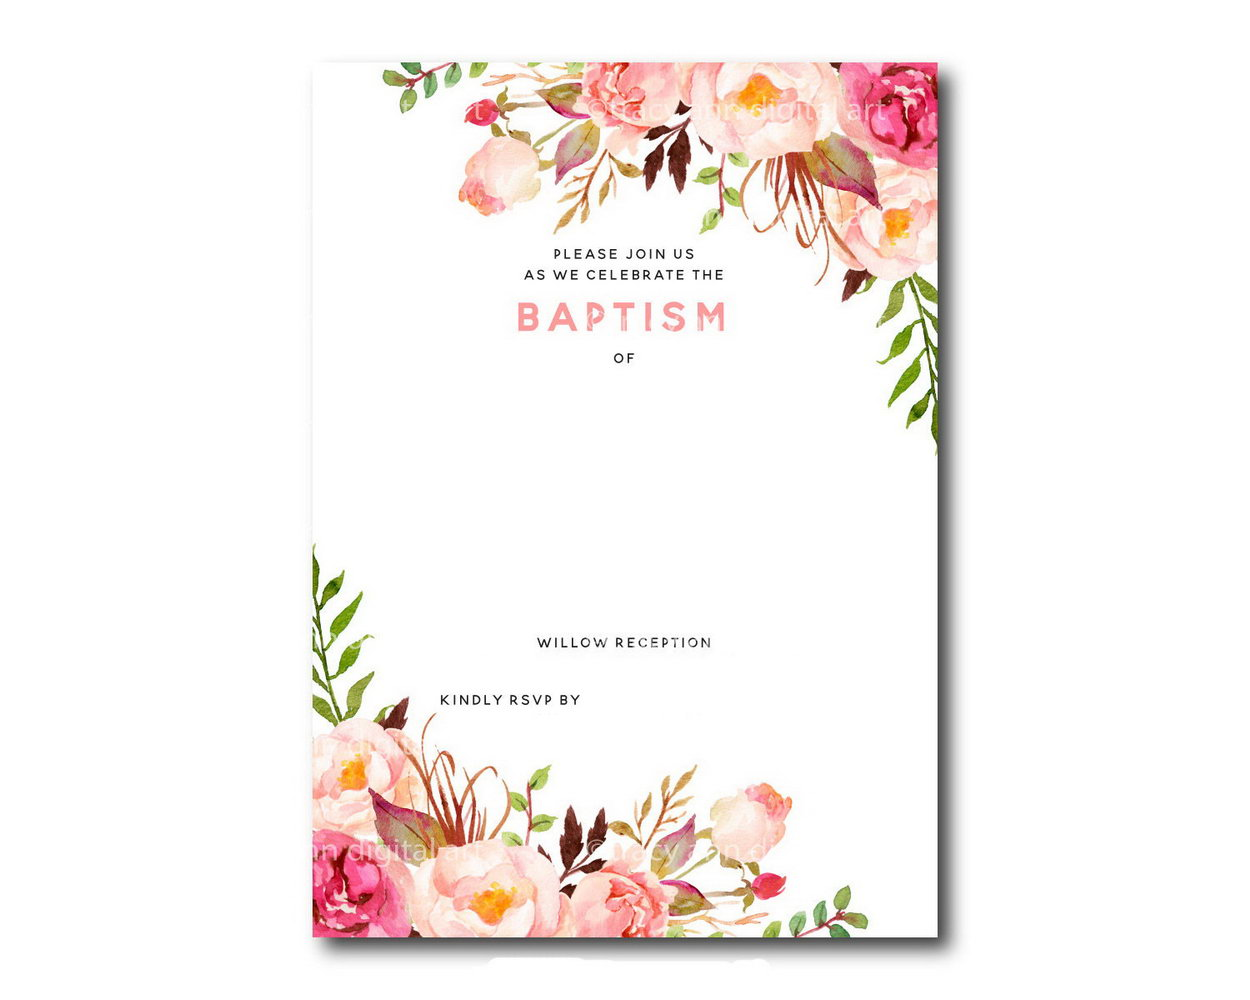 Free Bridal Shower Invitation Templates Downloads